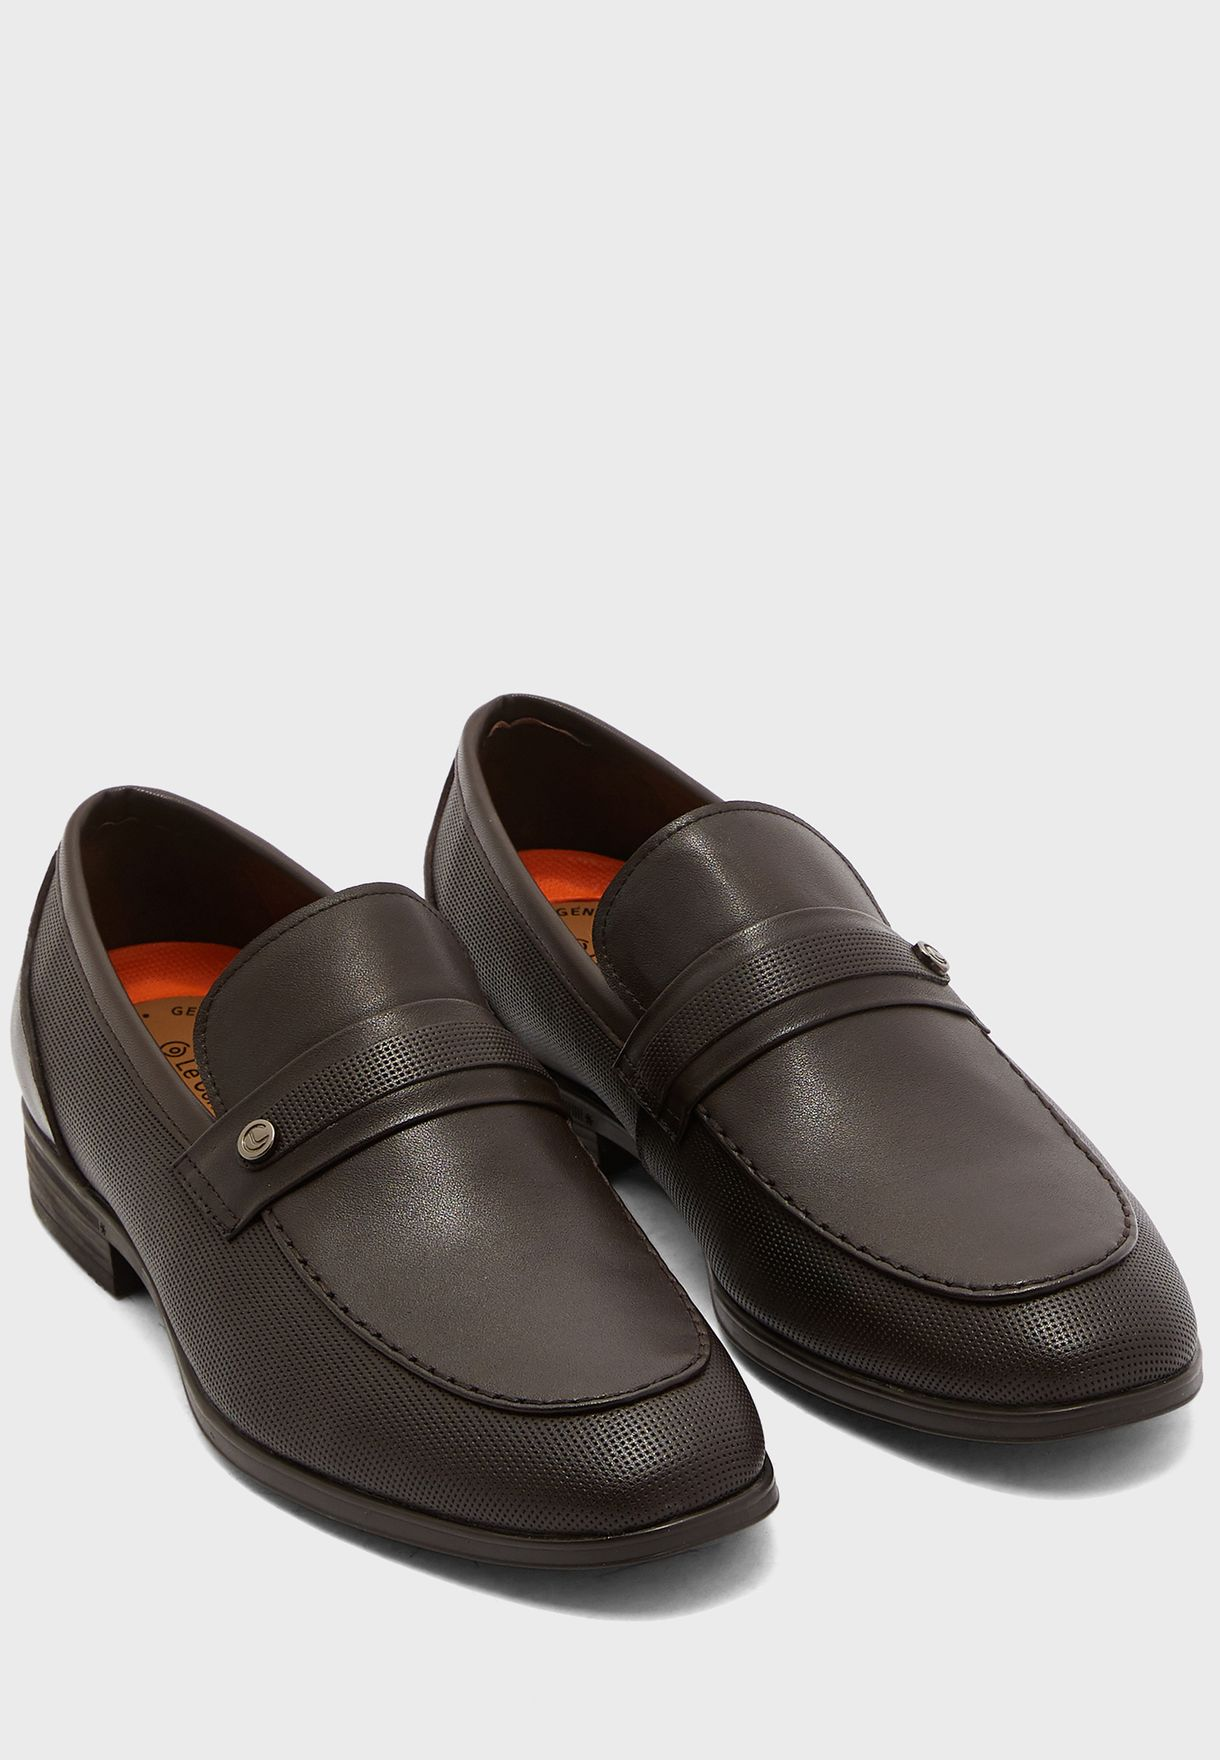 Single Monk Strap Loafers